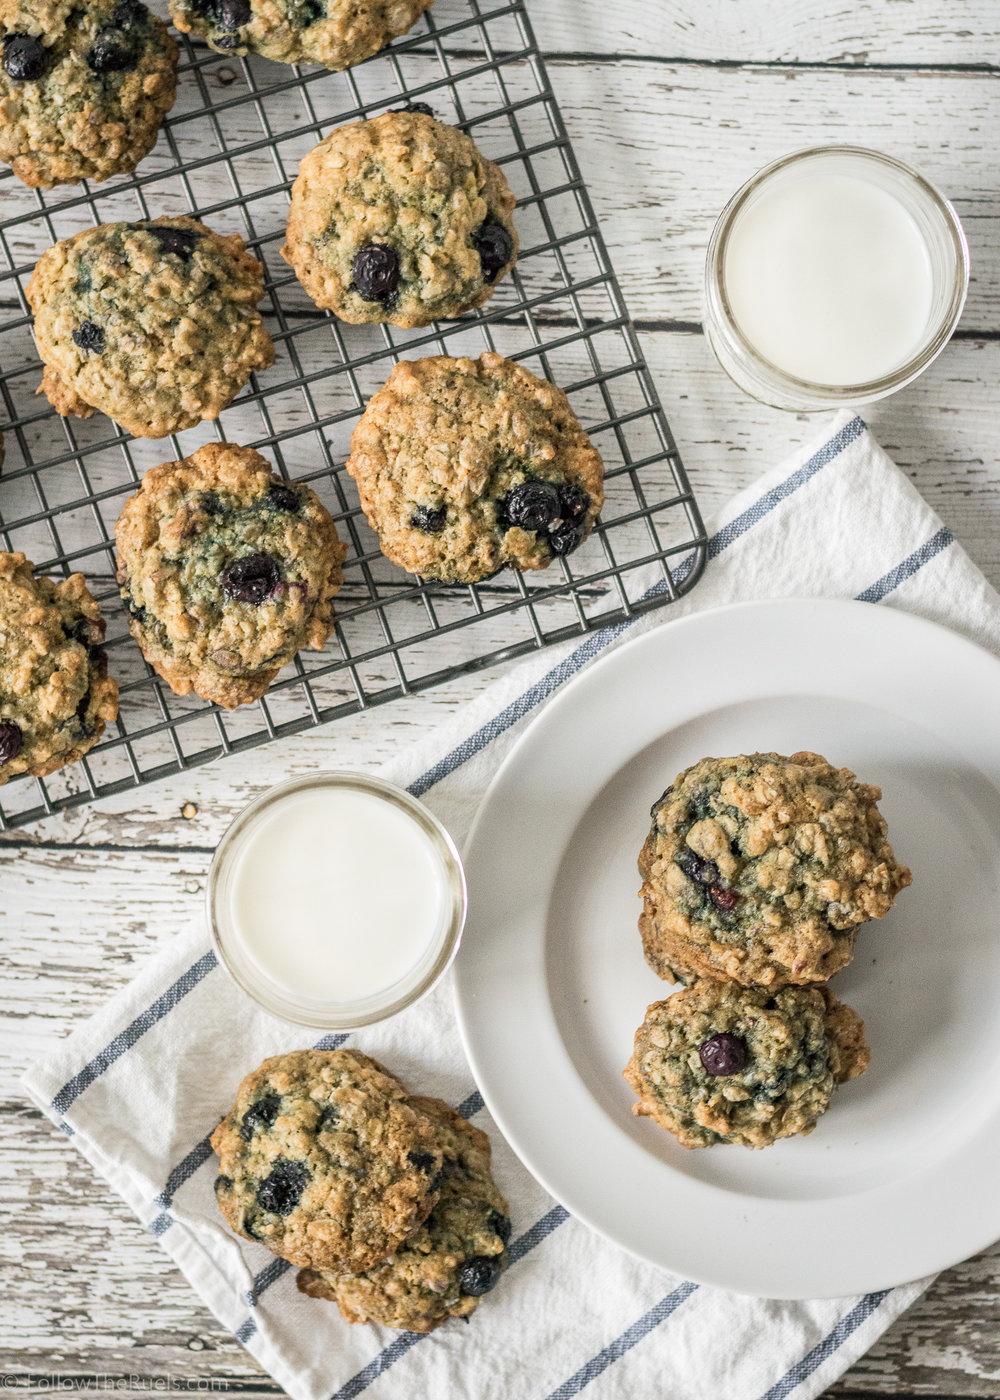 Blueberry-Oatmeal-Cookies-7.jpg